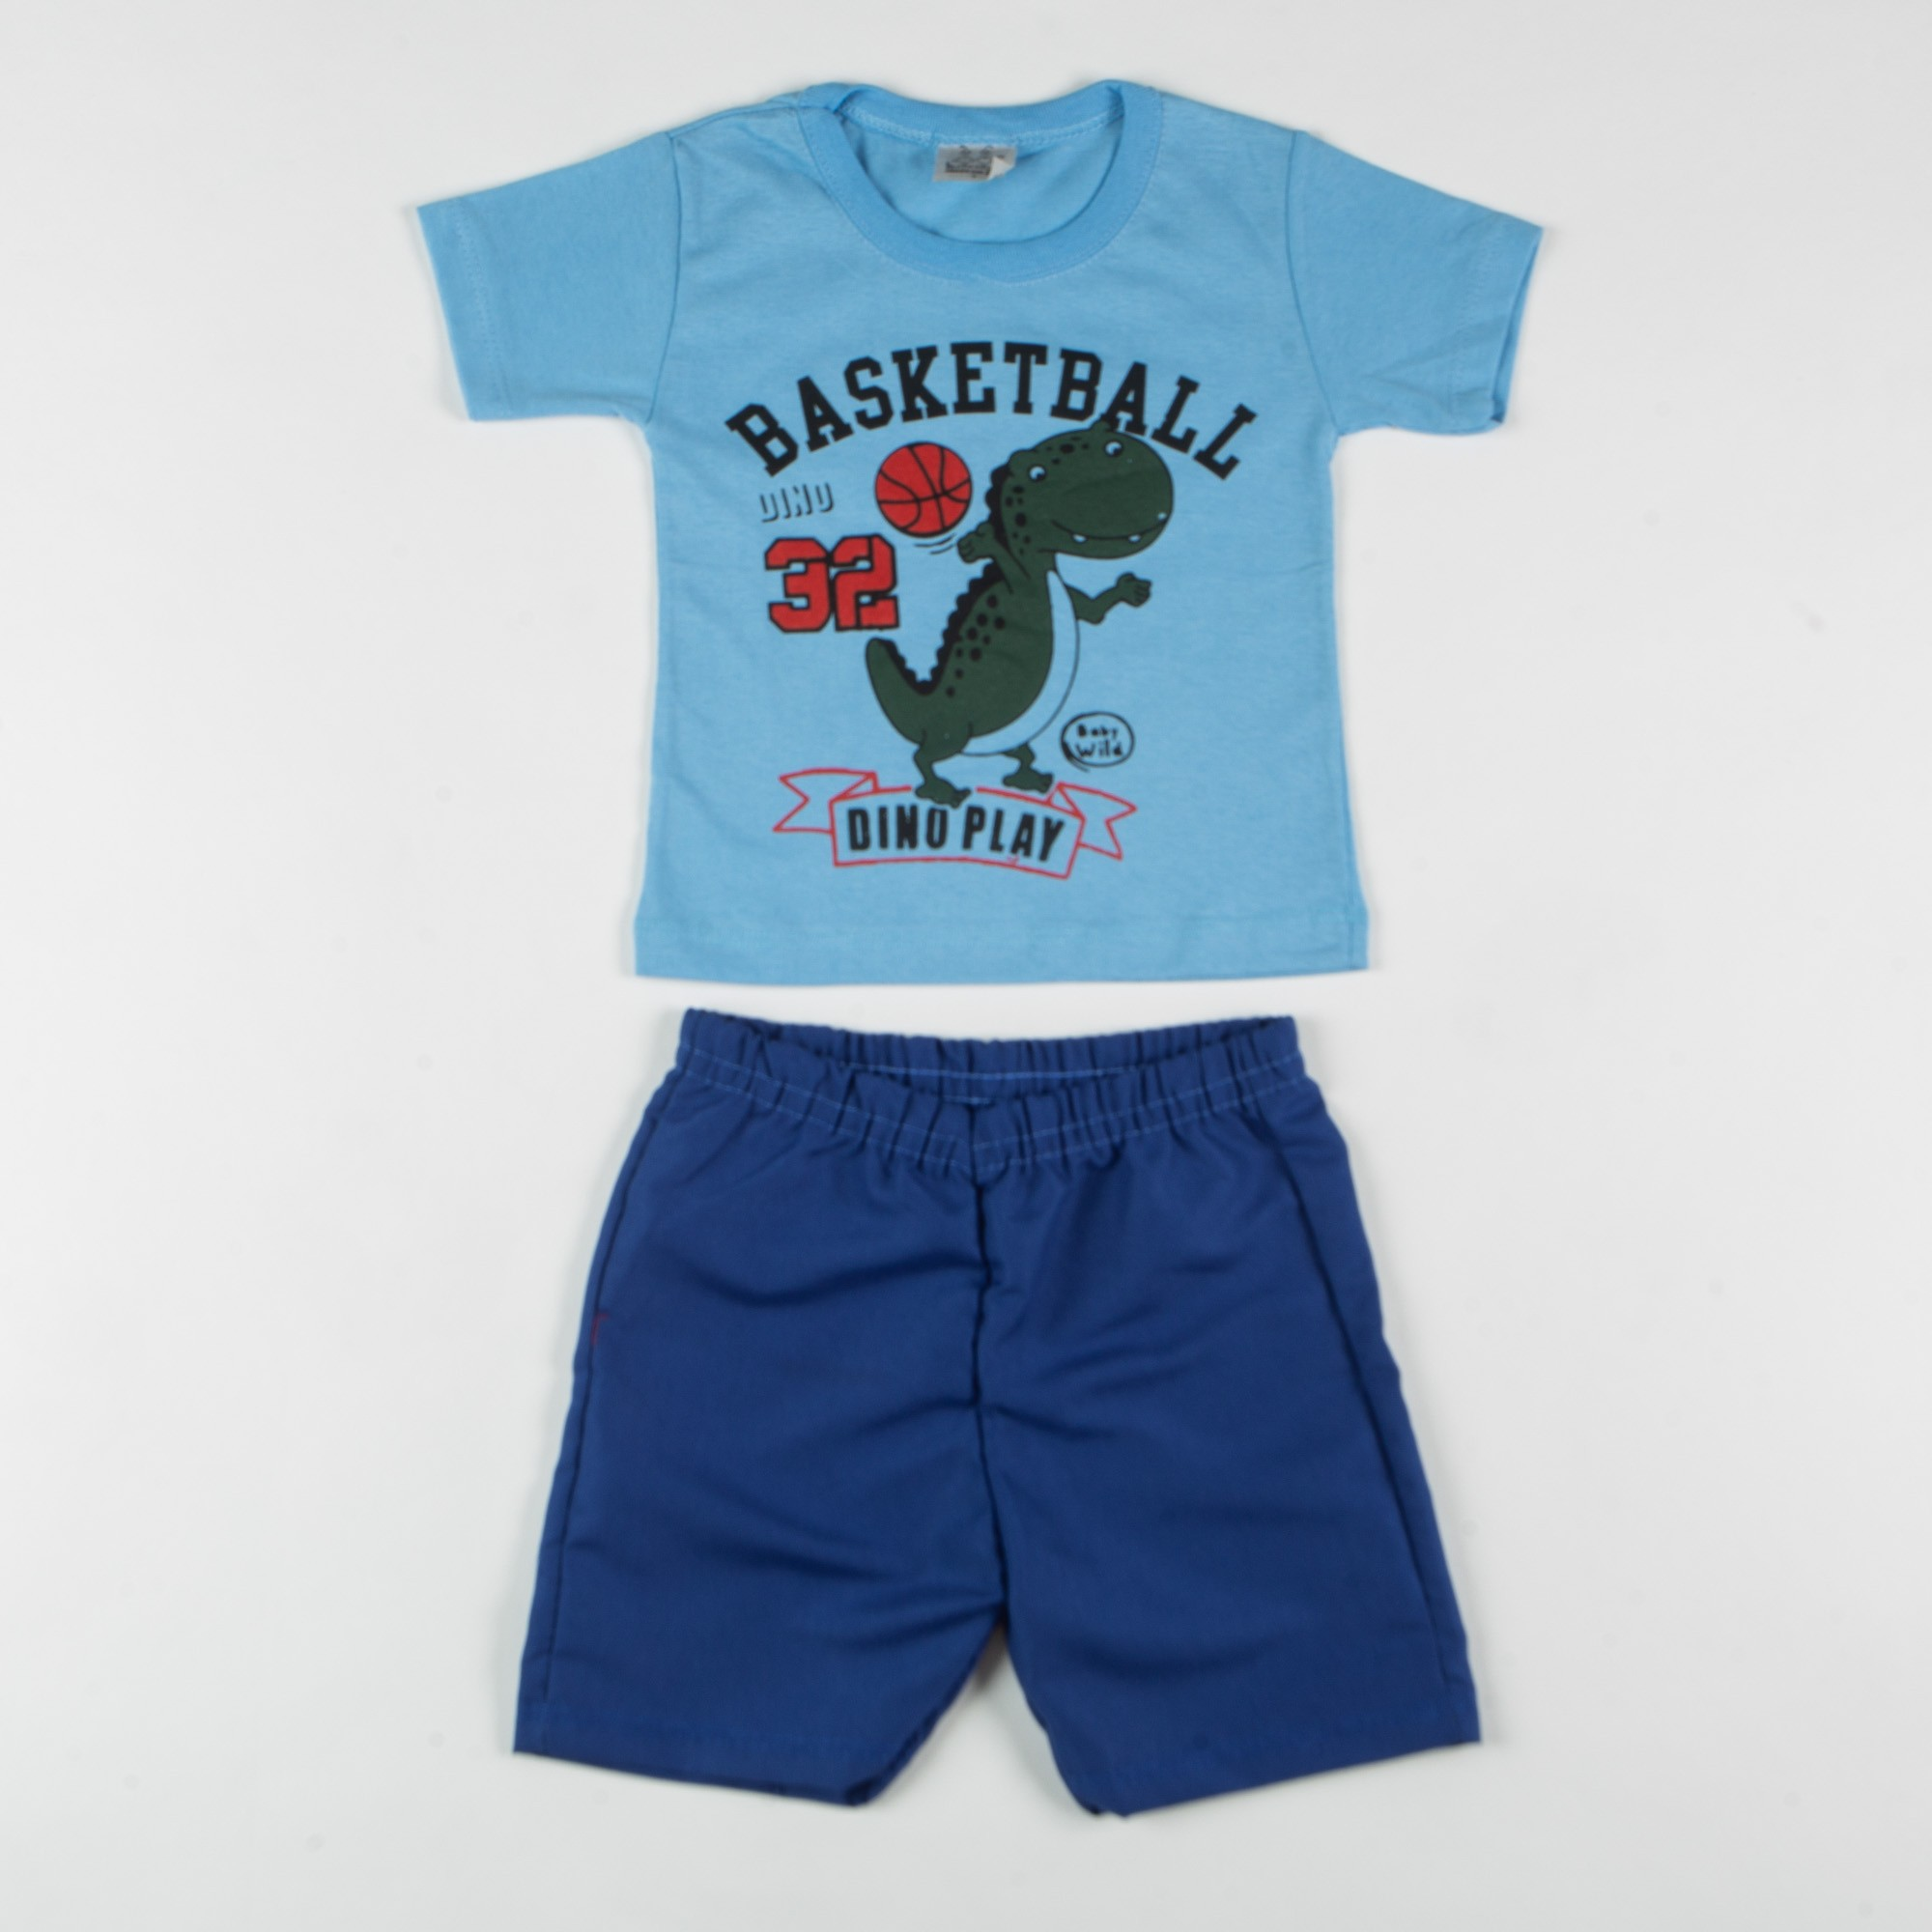 Conjunto Infantil Menino Desenho Basketball Dino Play